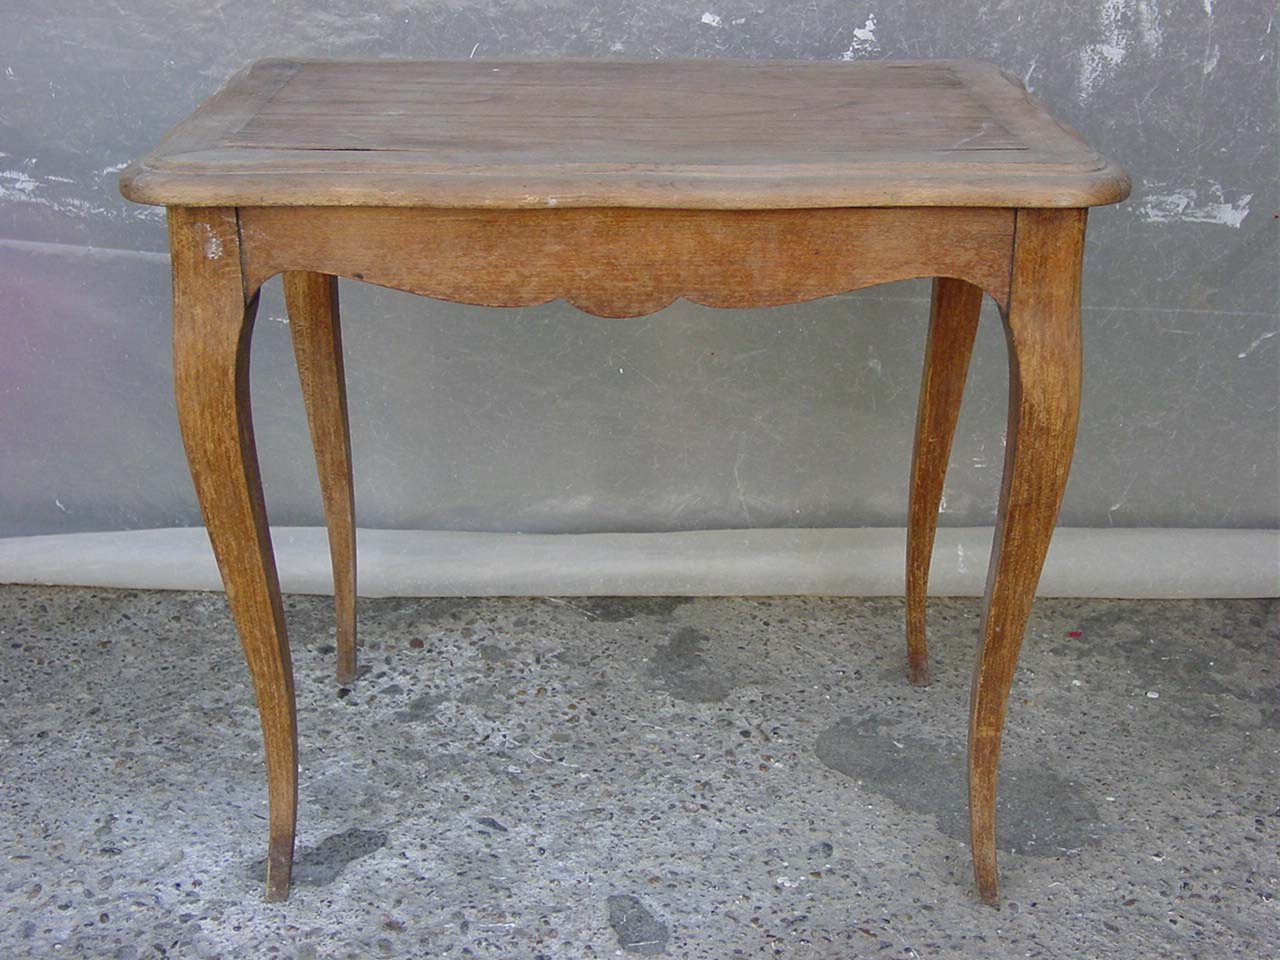 Les pr ts peindre 4 for Table a repasser largeur 52